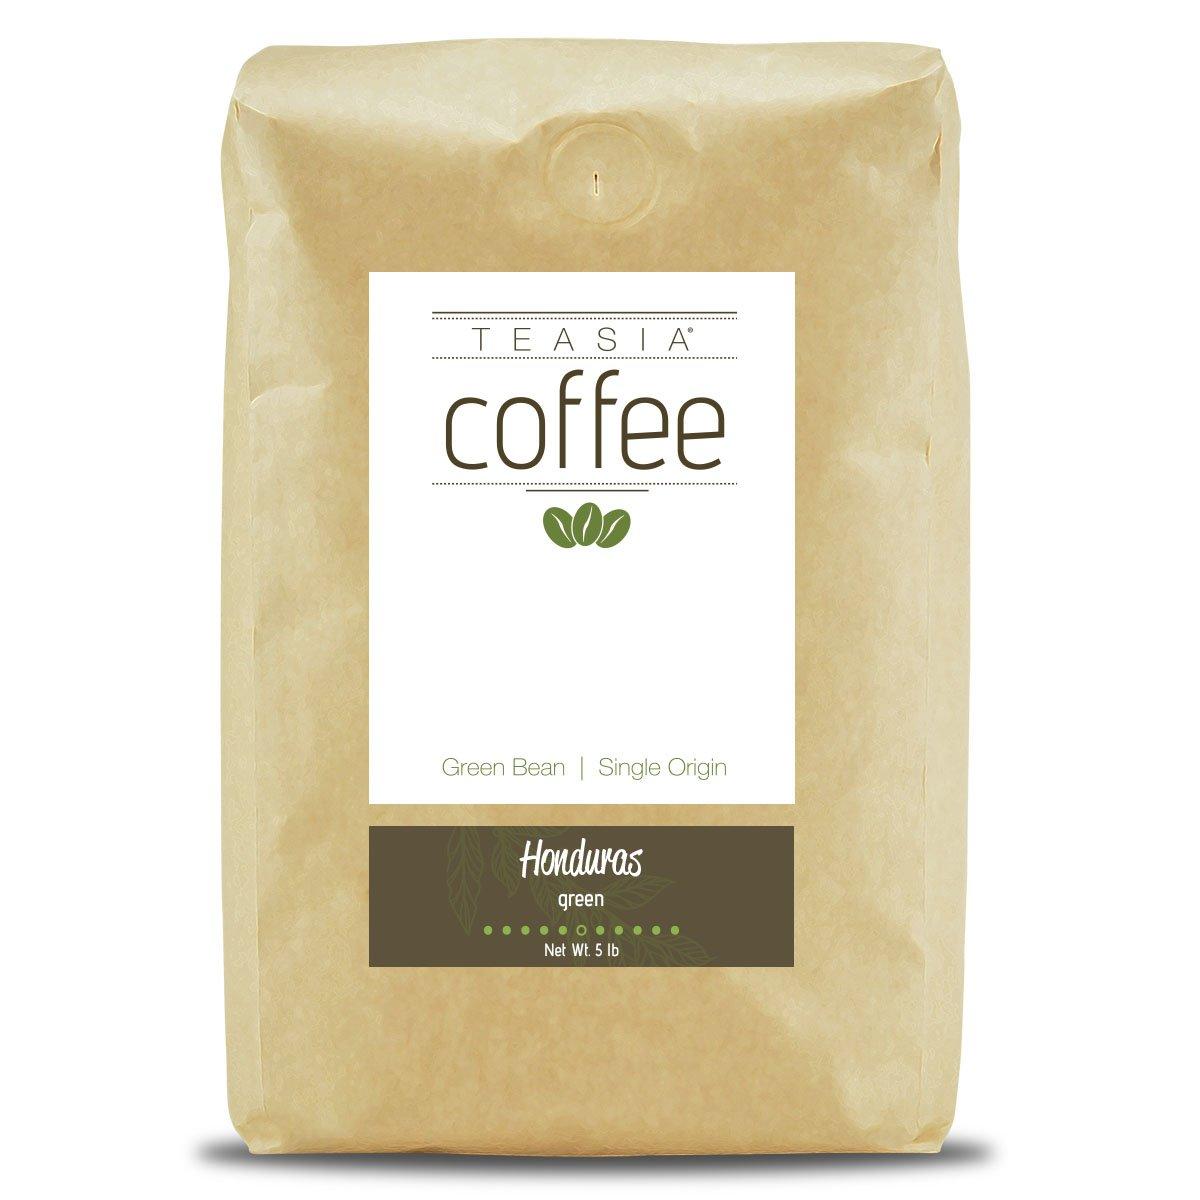 Teasia Coffee, Honduras, Green Unroasted Whole Coffee Beans, 5-Pound Bag